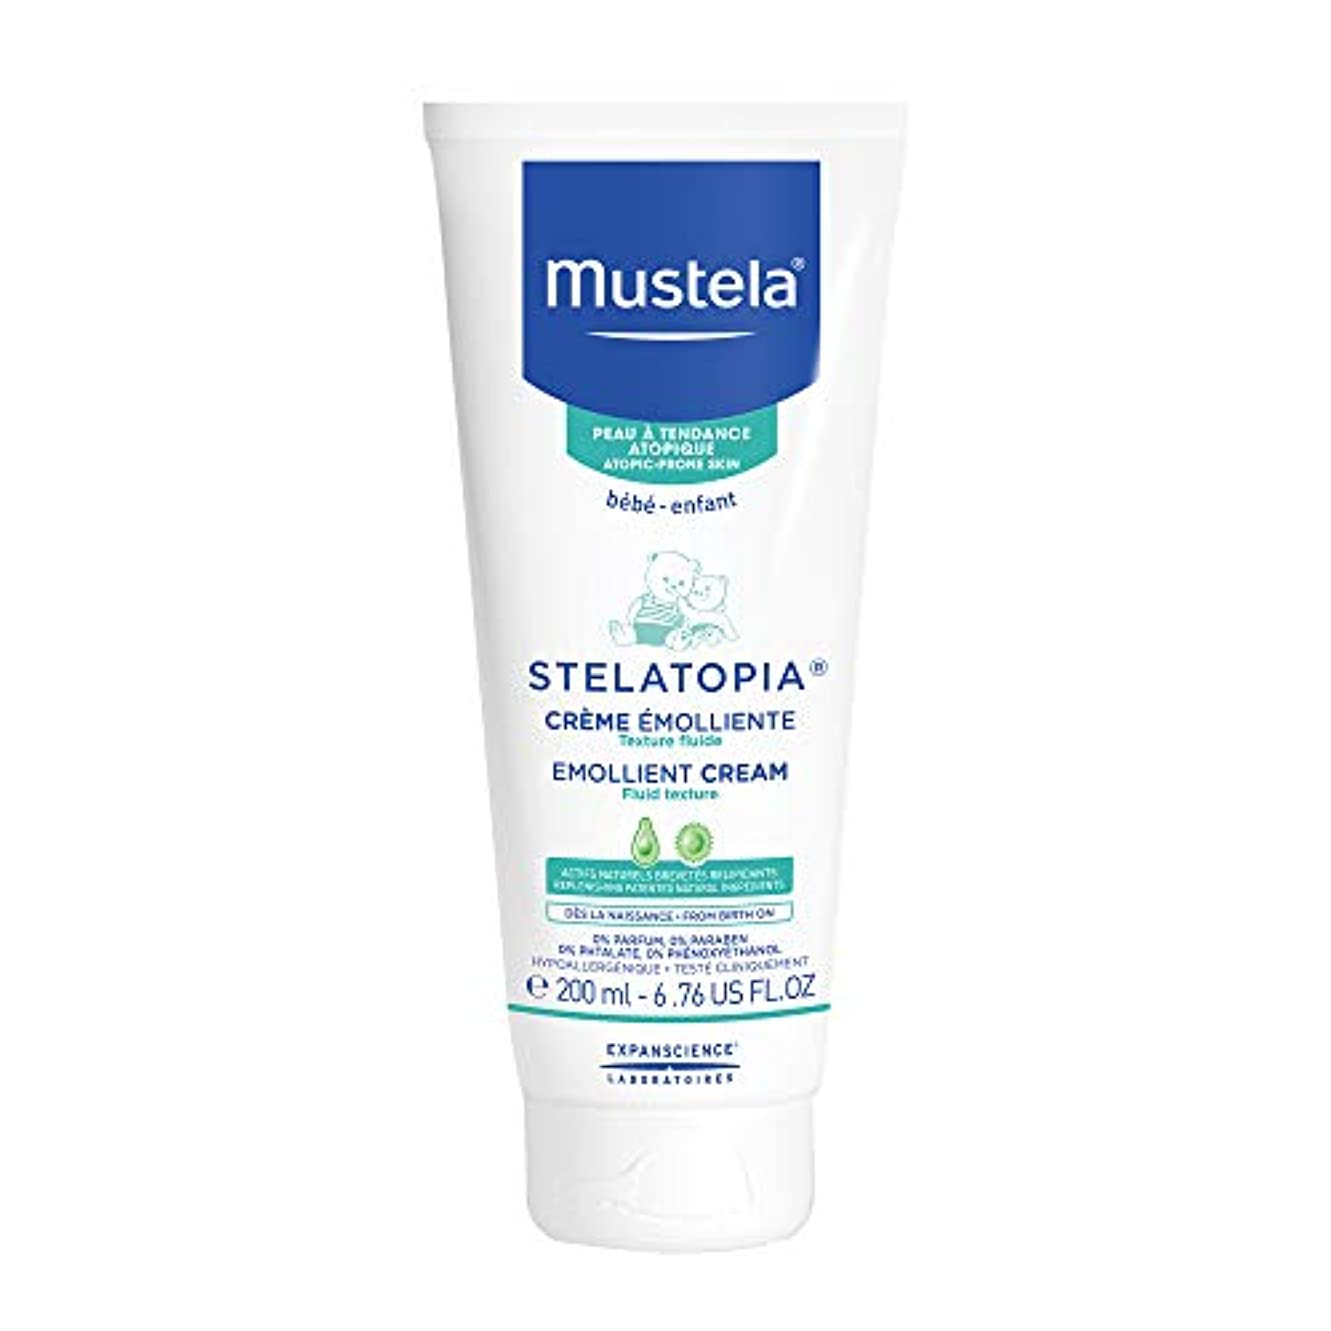 人間豚肉憲法Mustela - Stelatopia Emollient Cream (6.76 oz.)